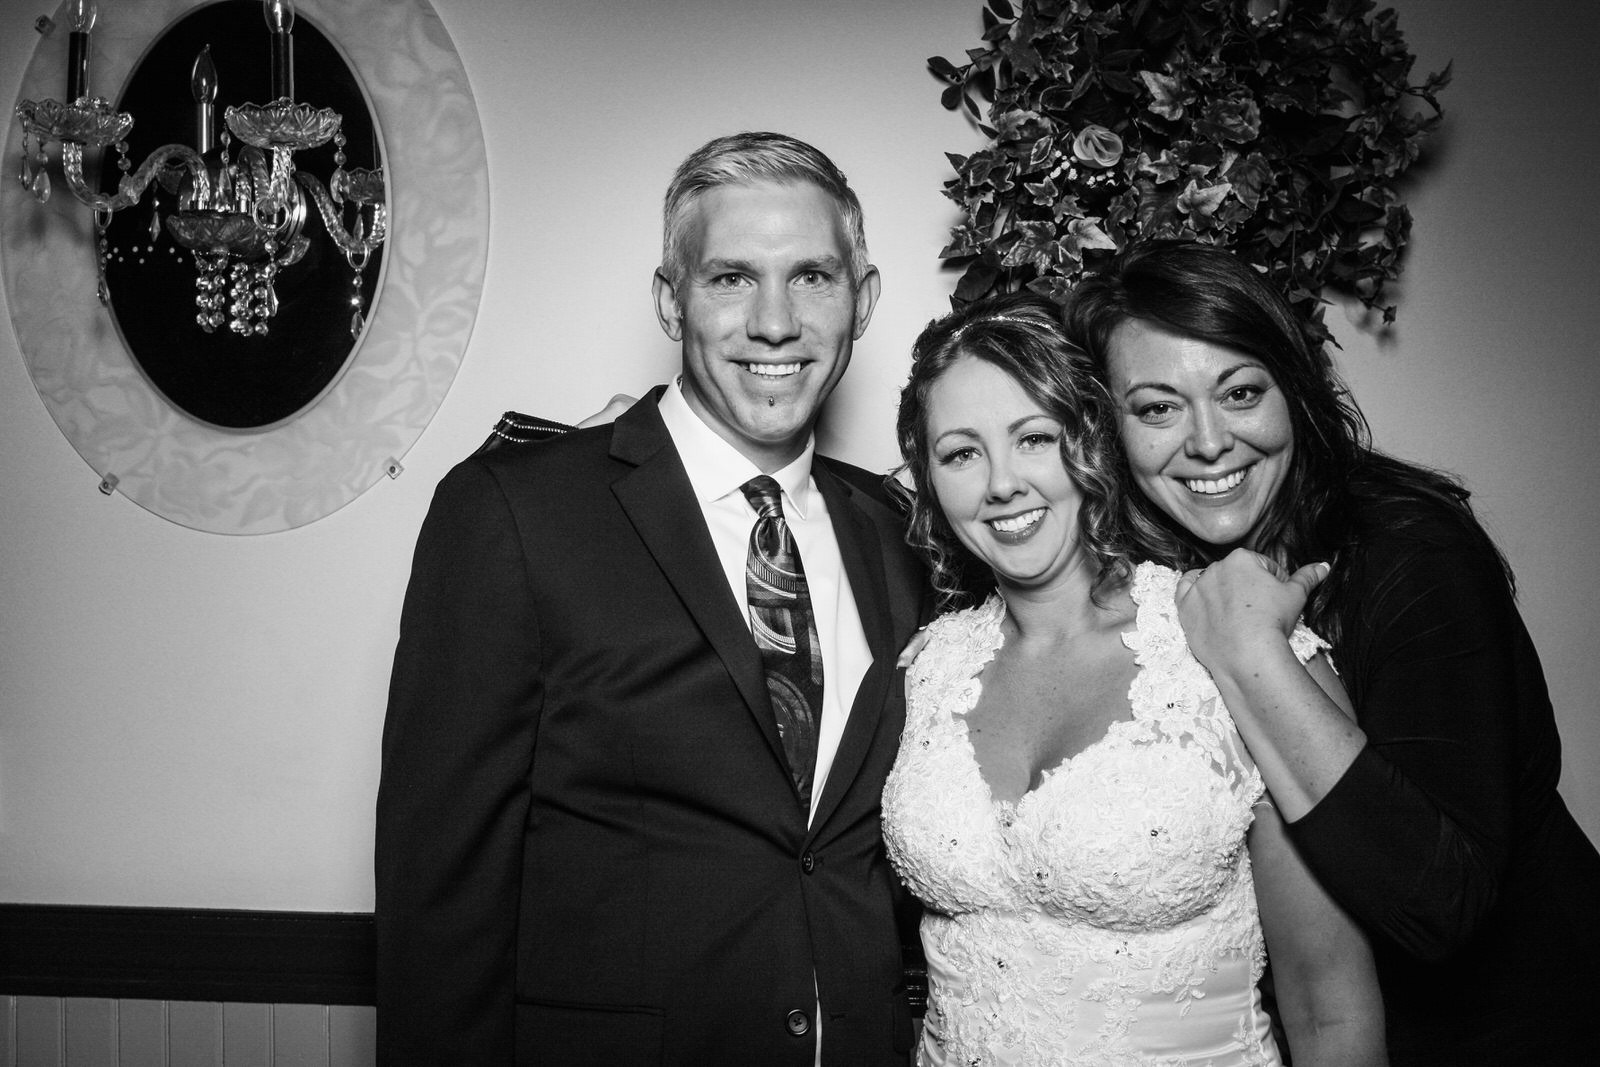 Ryan-Christine-Wedding-Photo-Booth-4.jpg